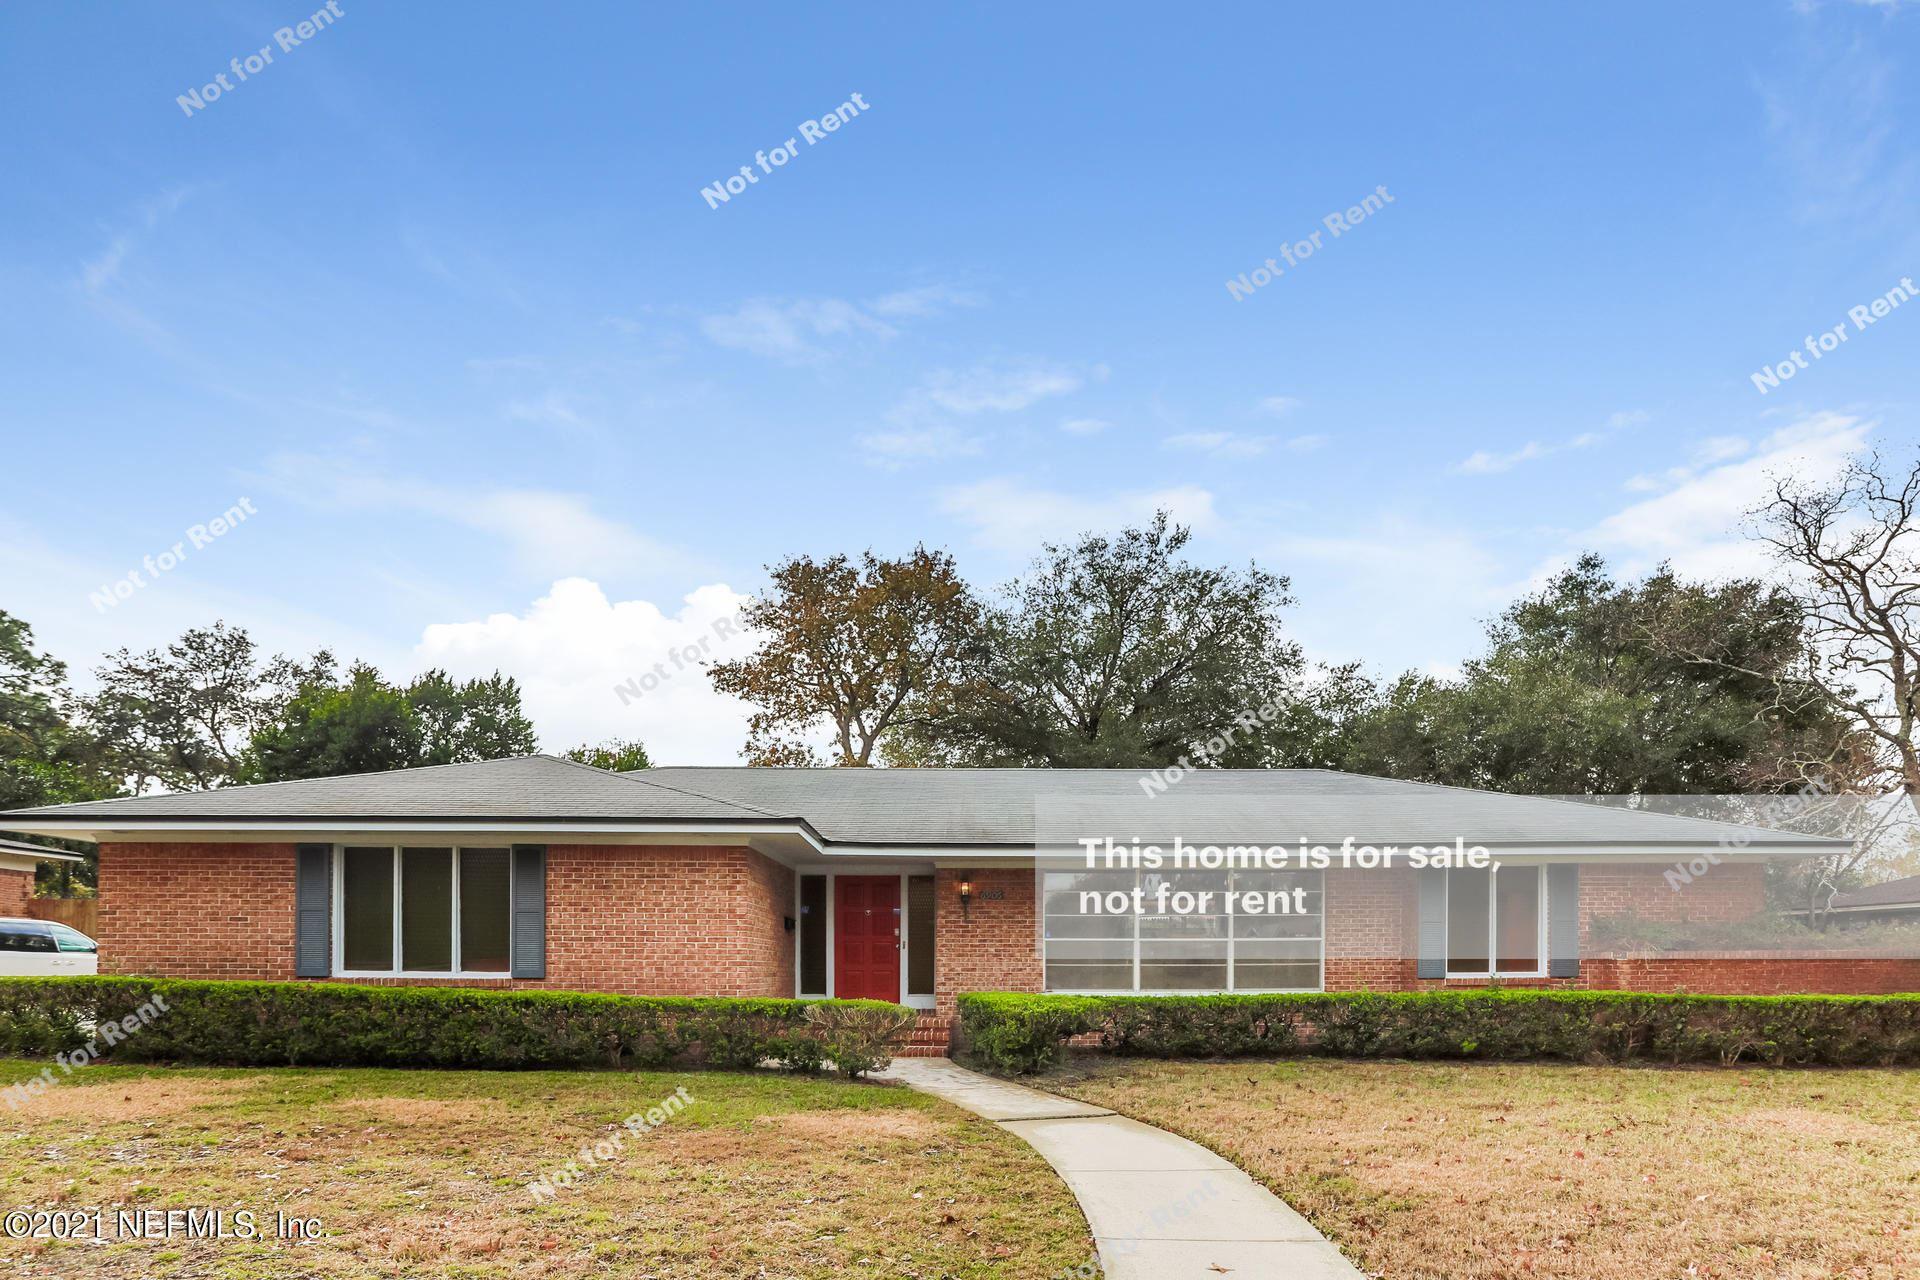 6906 ARIEL DR, Jacksonville, FL 32277 - MLS#: 1092596